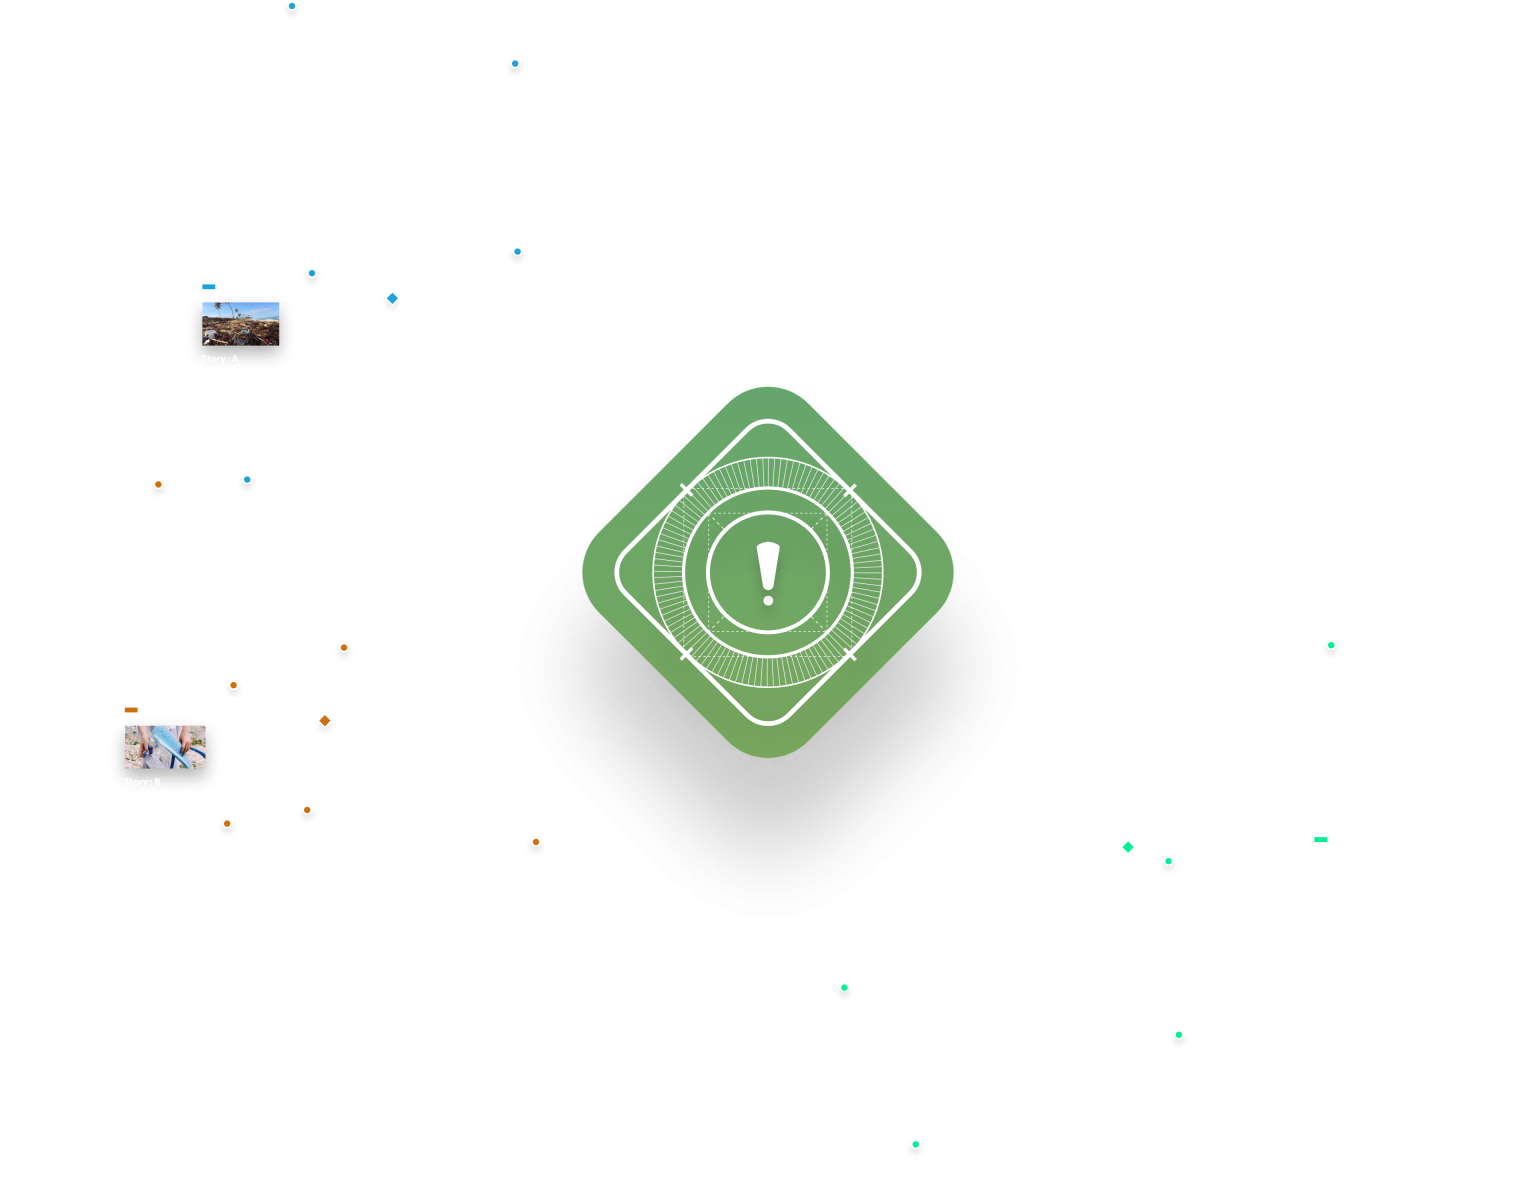 alva monitor, automated media monitoring software